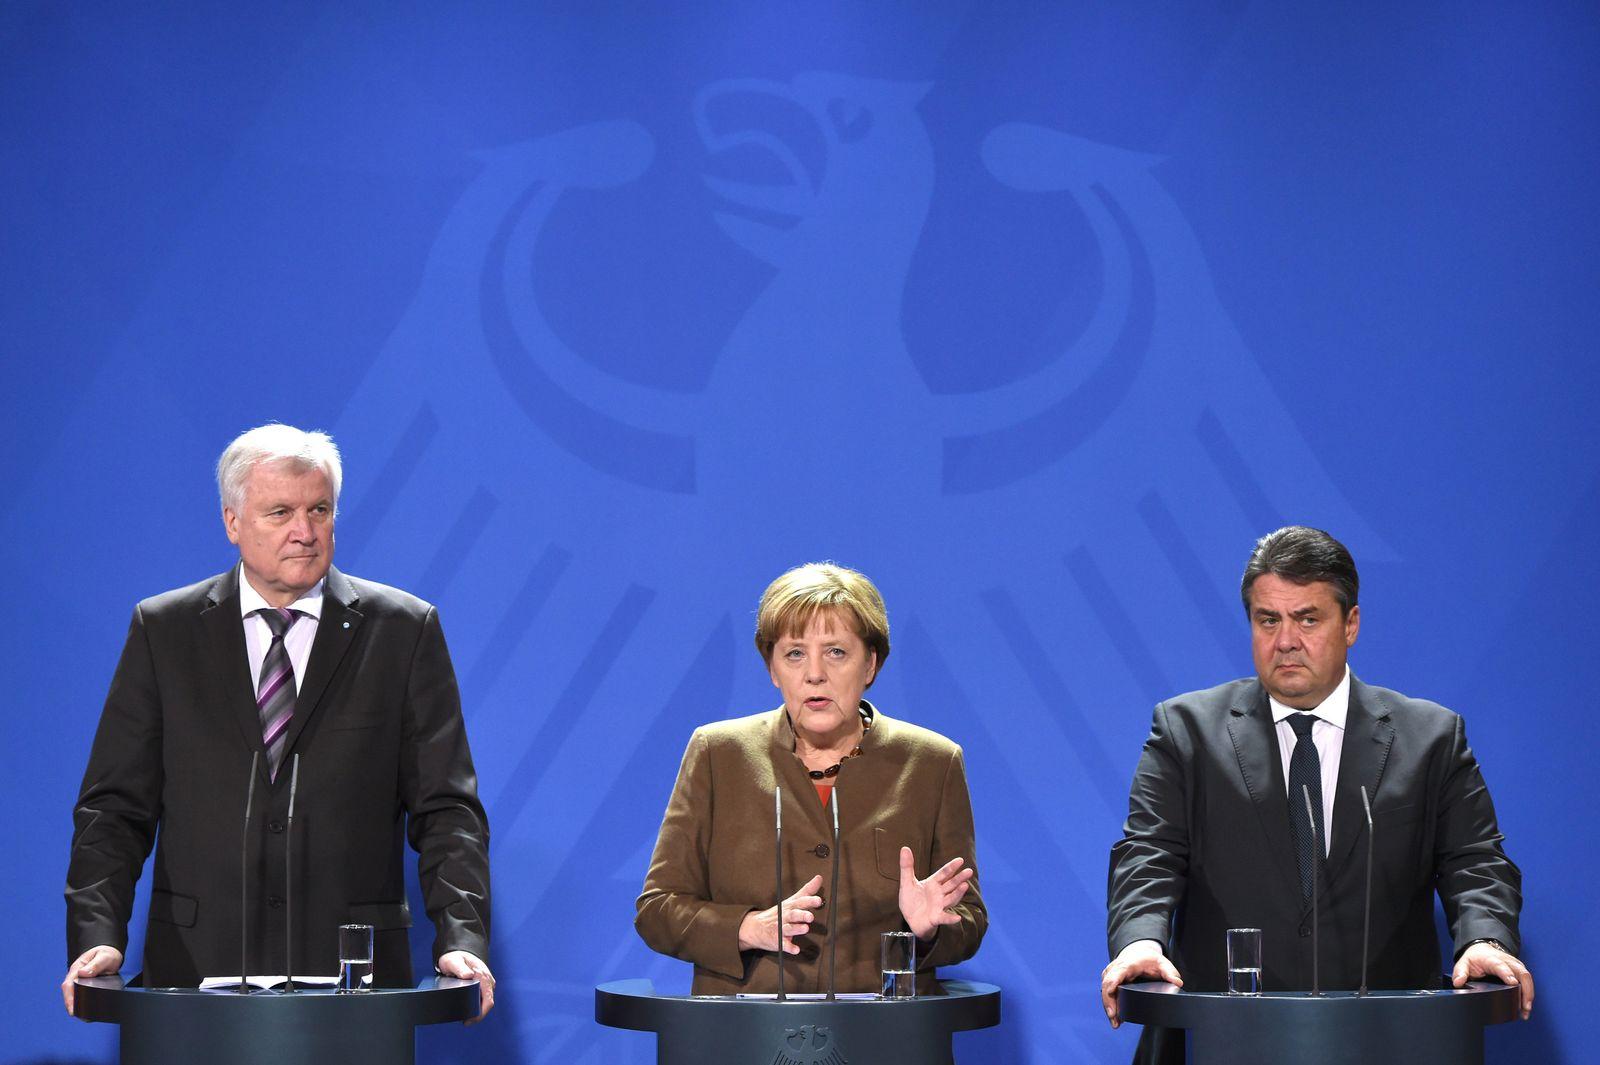 Horst Seehofer/ Angela Merkel/ Sigmar Gabriel